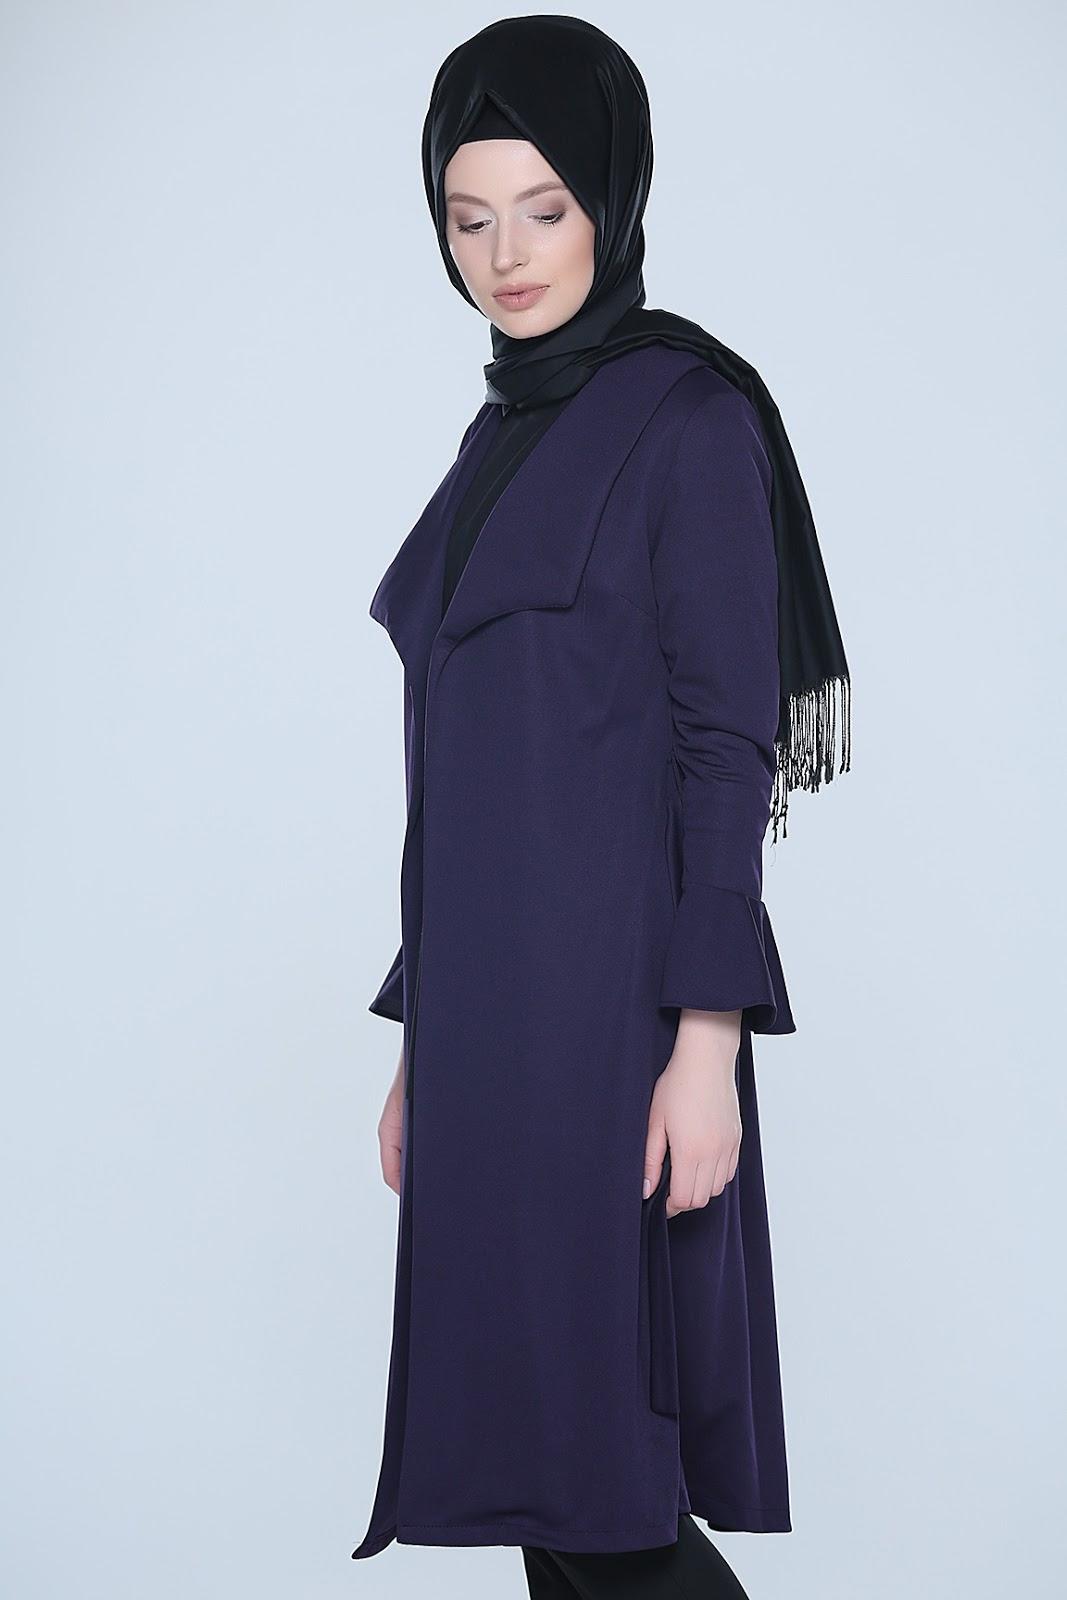 Hijab Hiver 2018 Hijab Mode Hijab Fashion And Chic Style